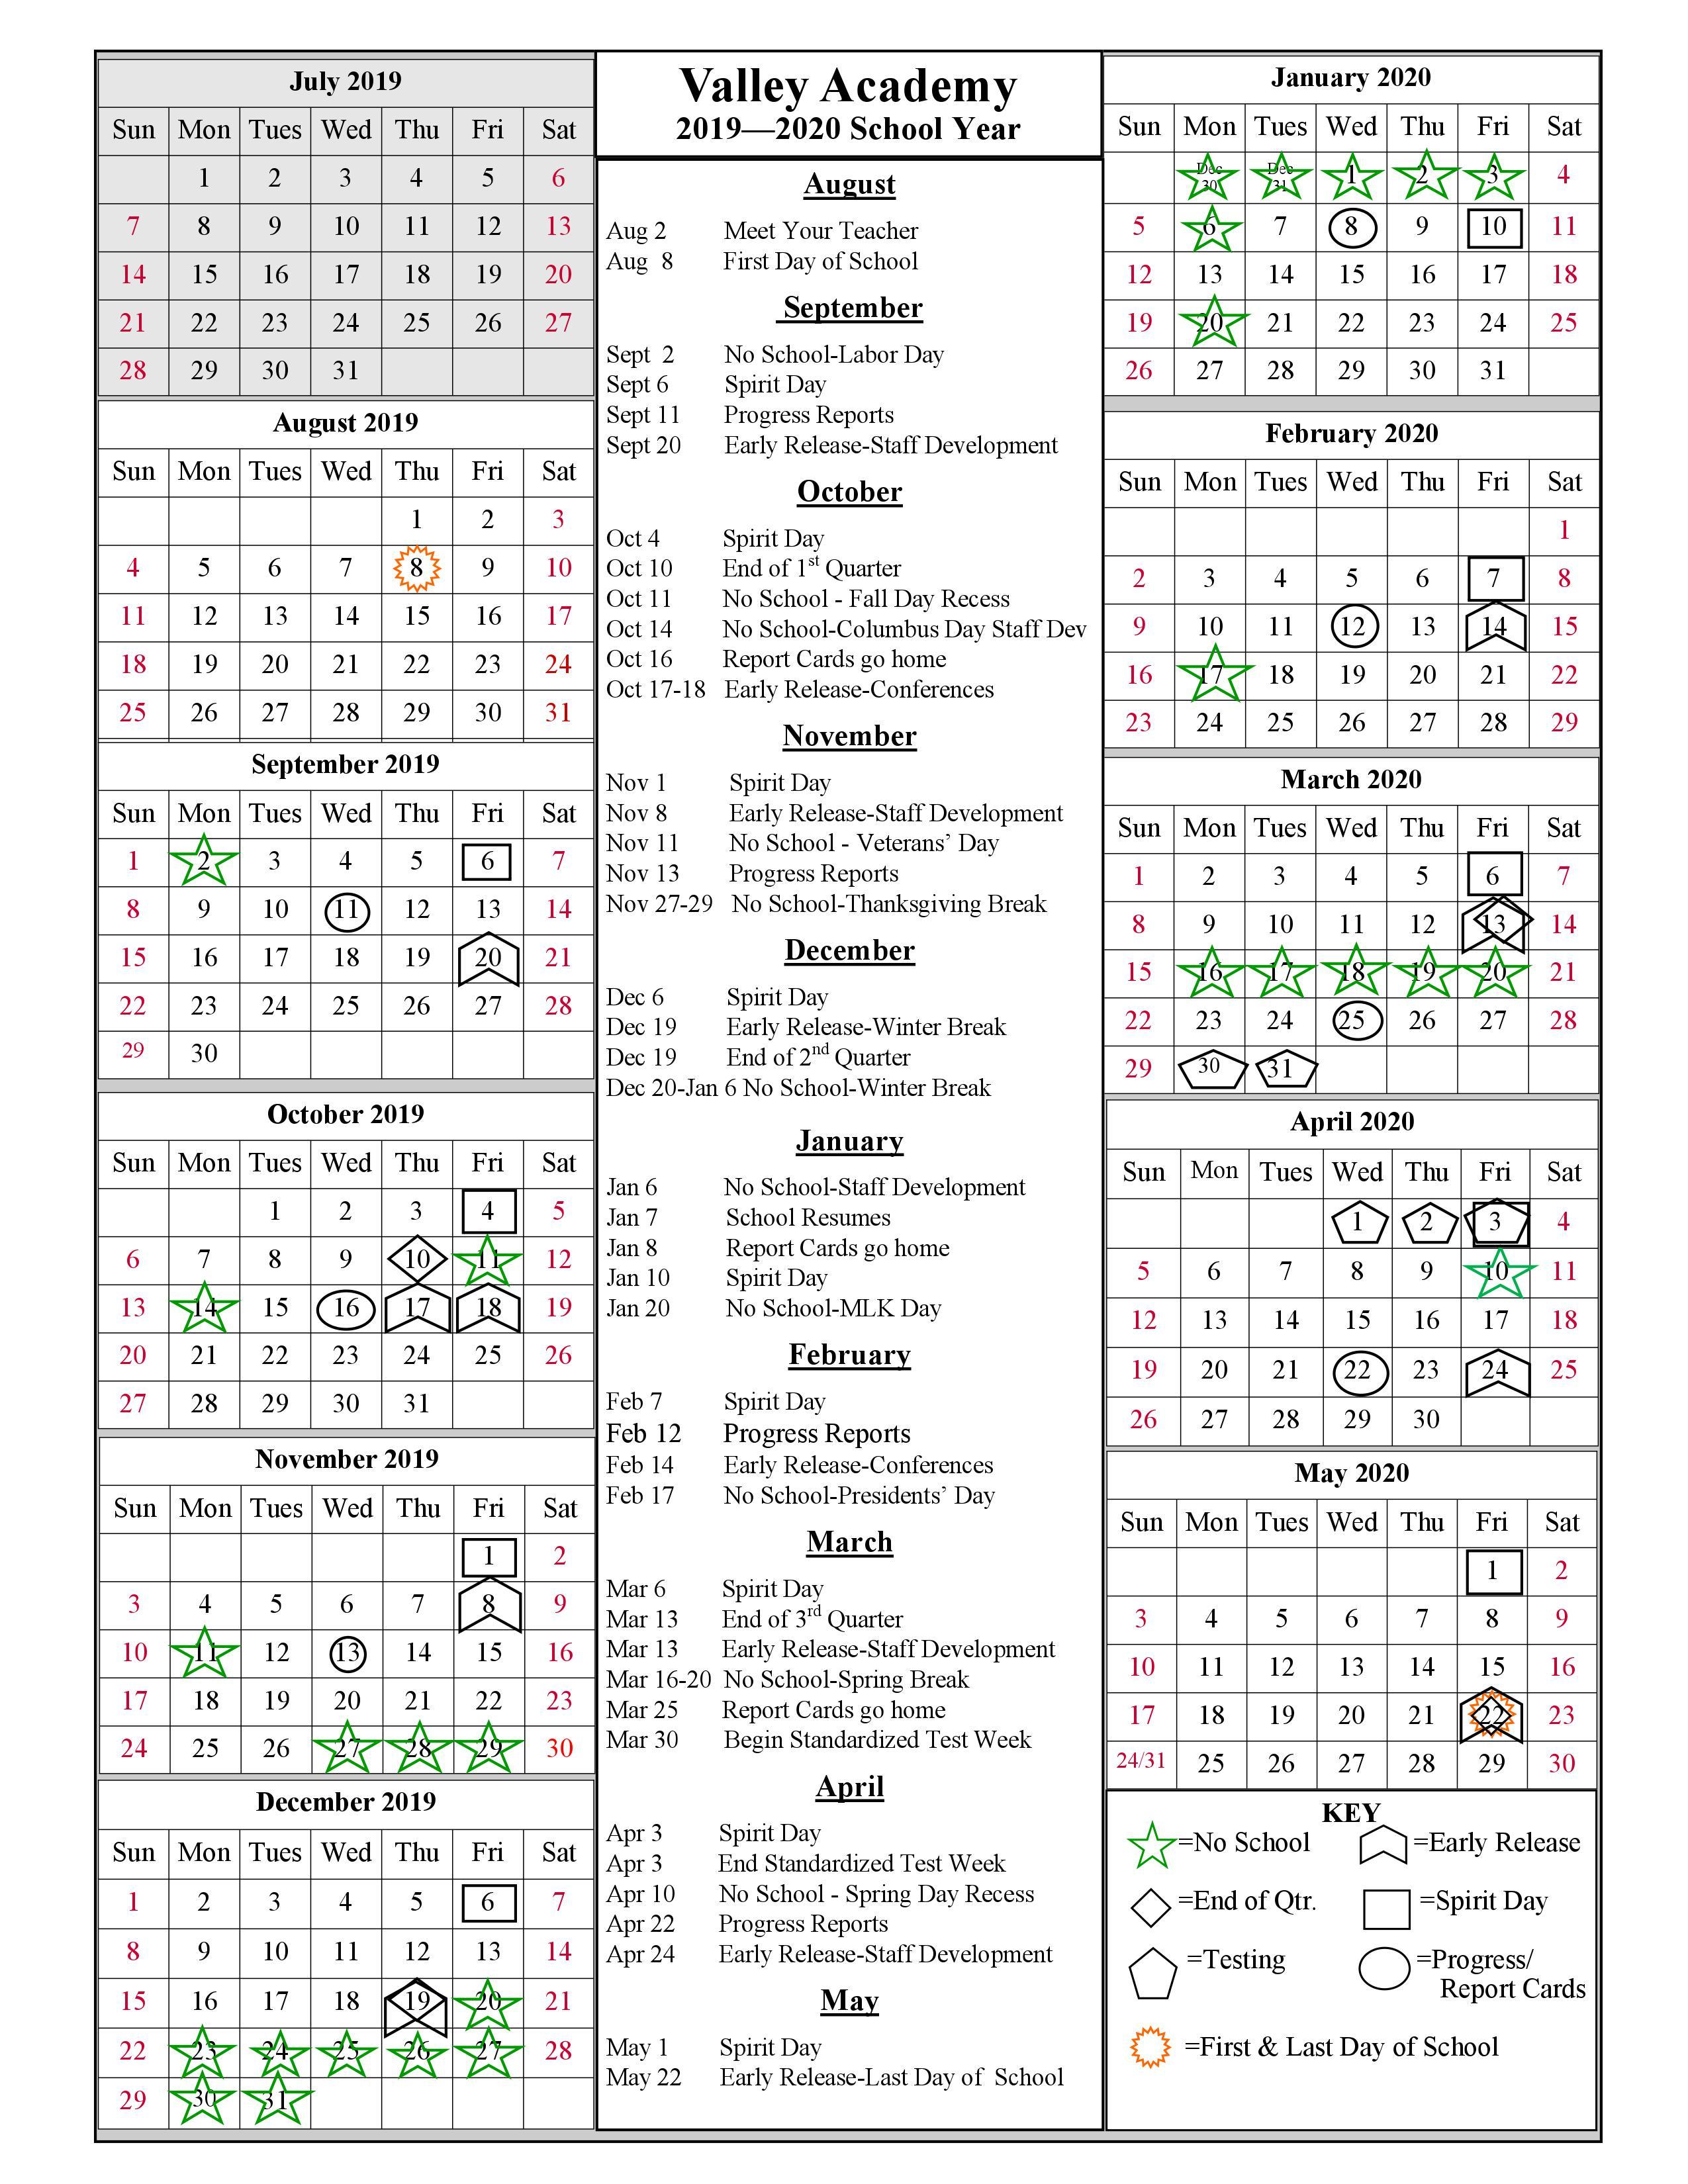 School Year Calendar 2019-2020 | Valley Academy pertaining to Gcu Academic Calendar 2021 20